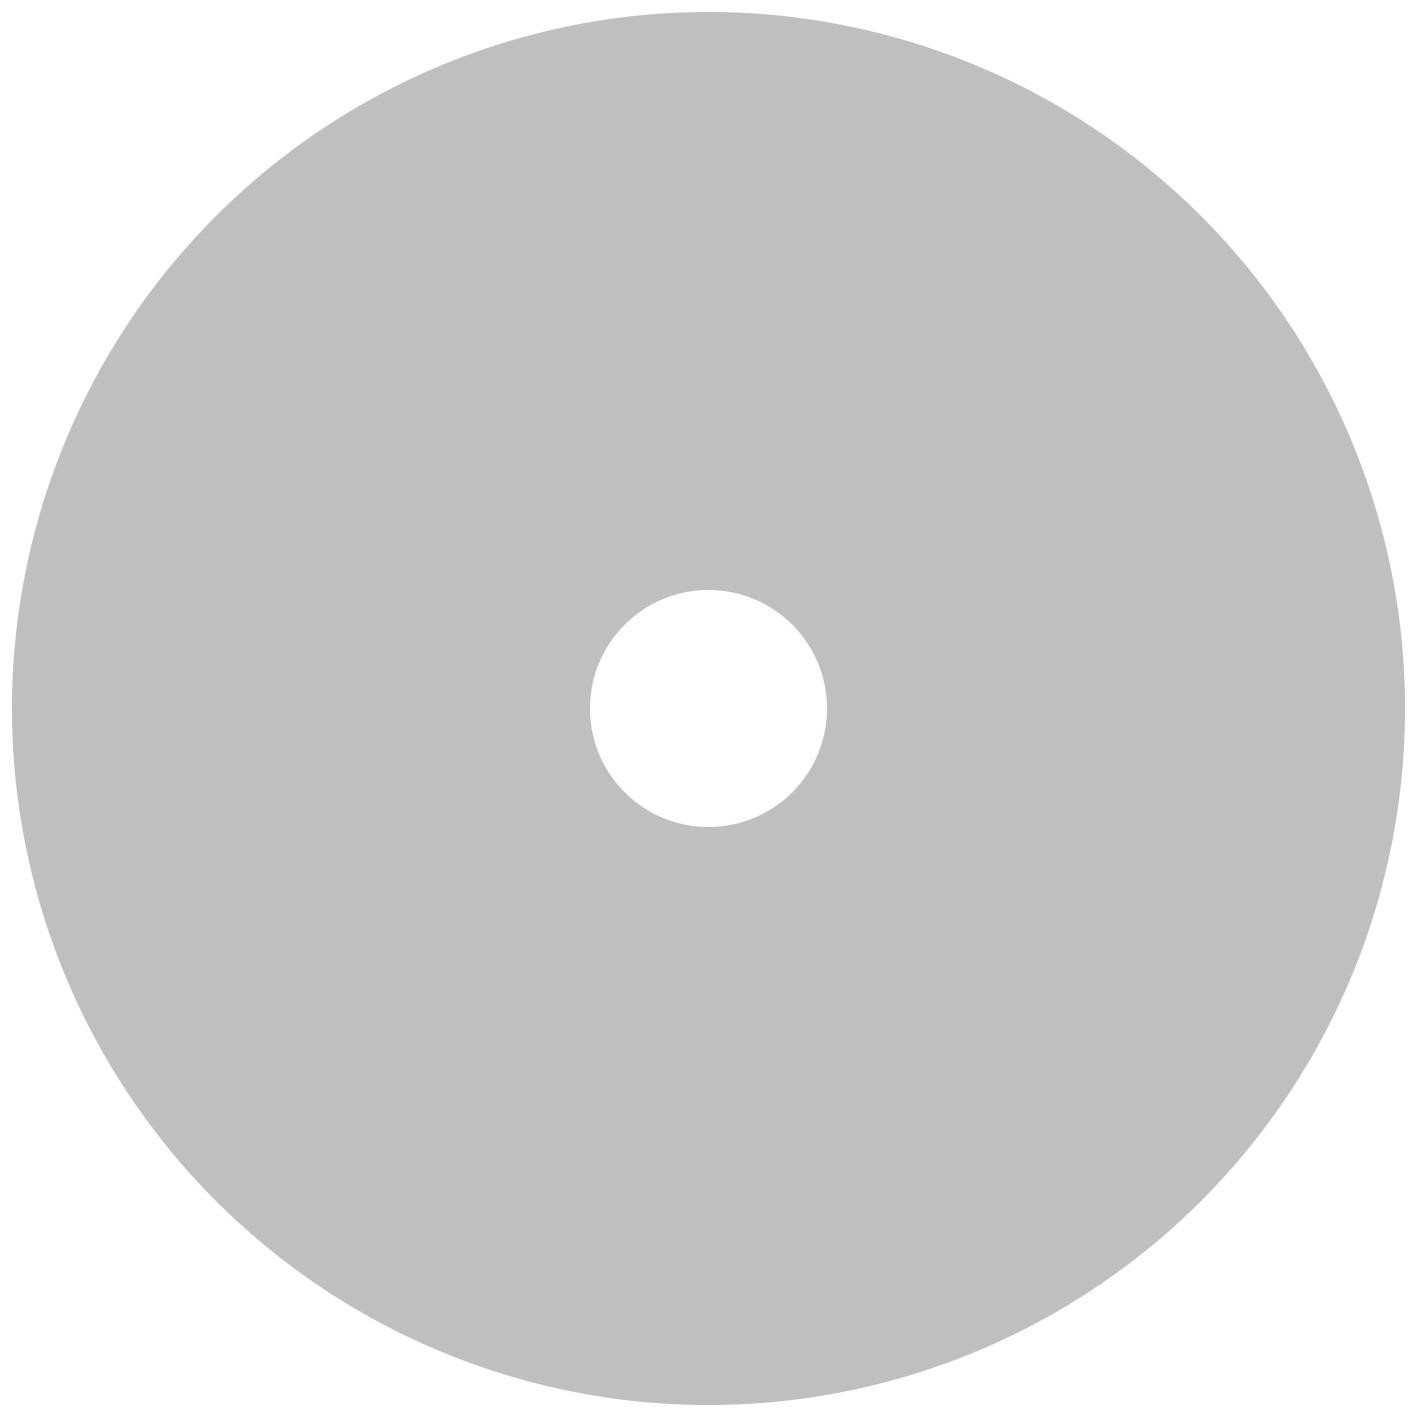 cd template